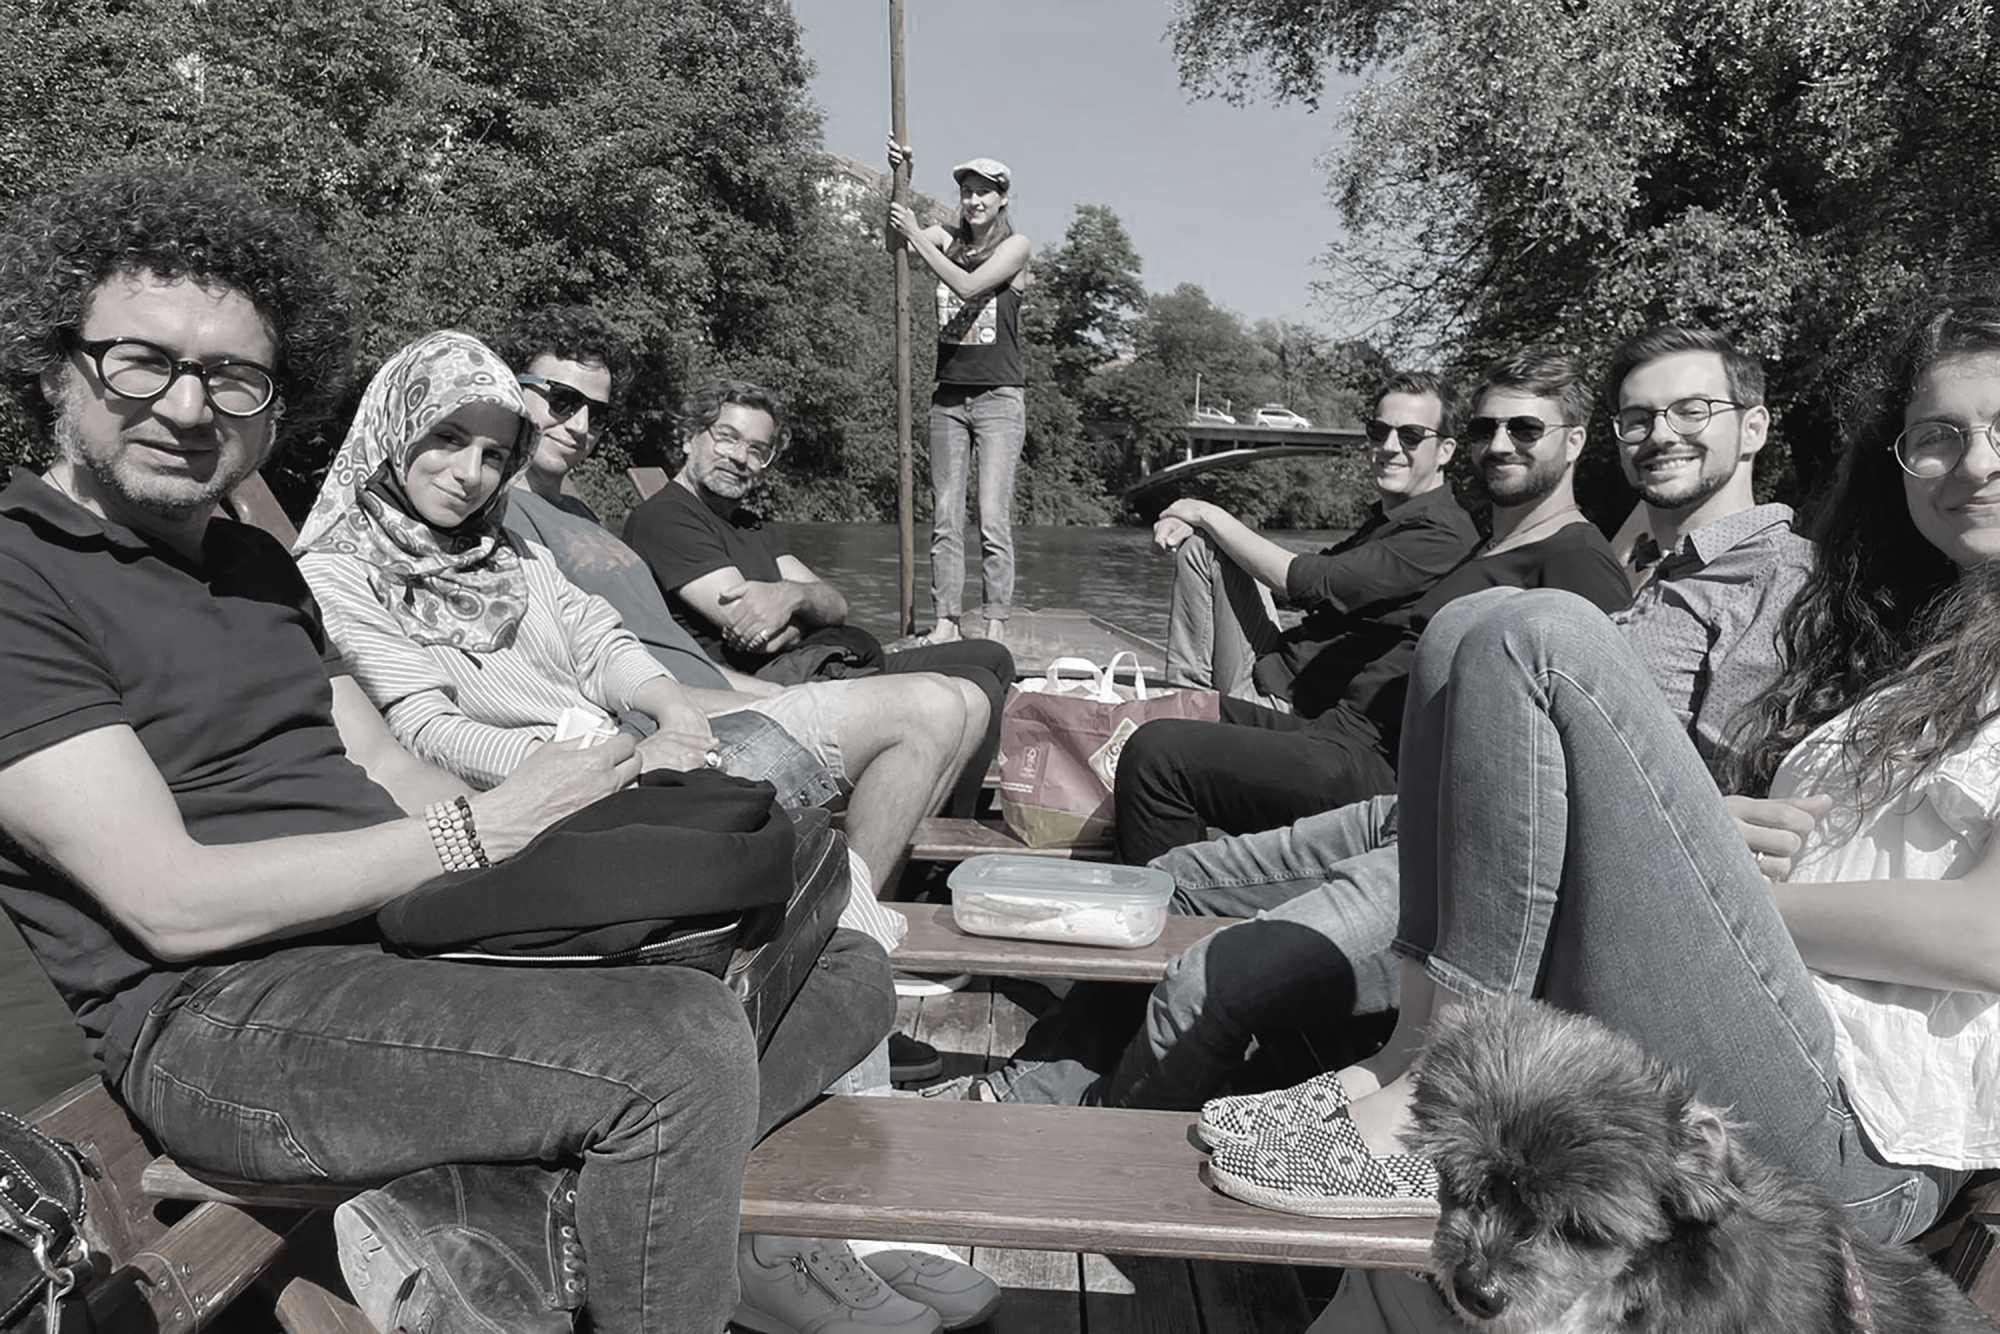 Bürosommerfest mit Stocherkahnfahrt auf dem Neckar ({project_images:field_row_count})